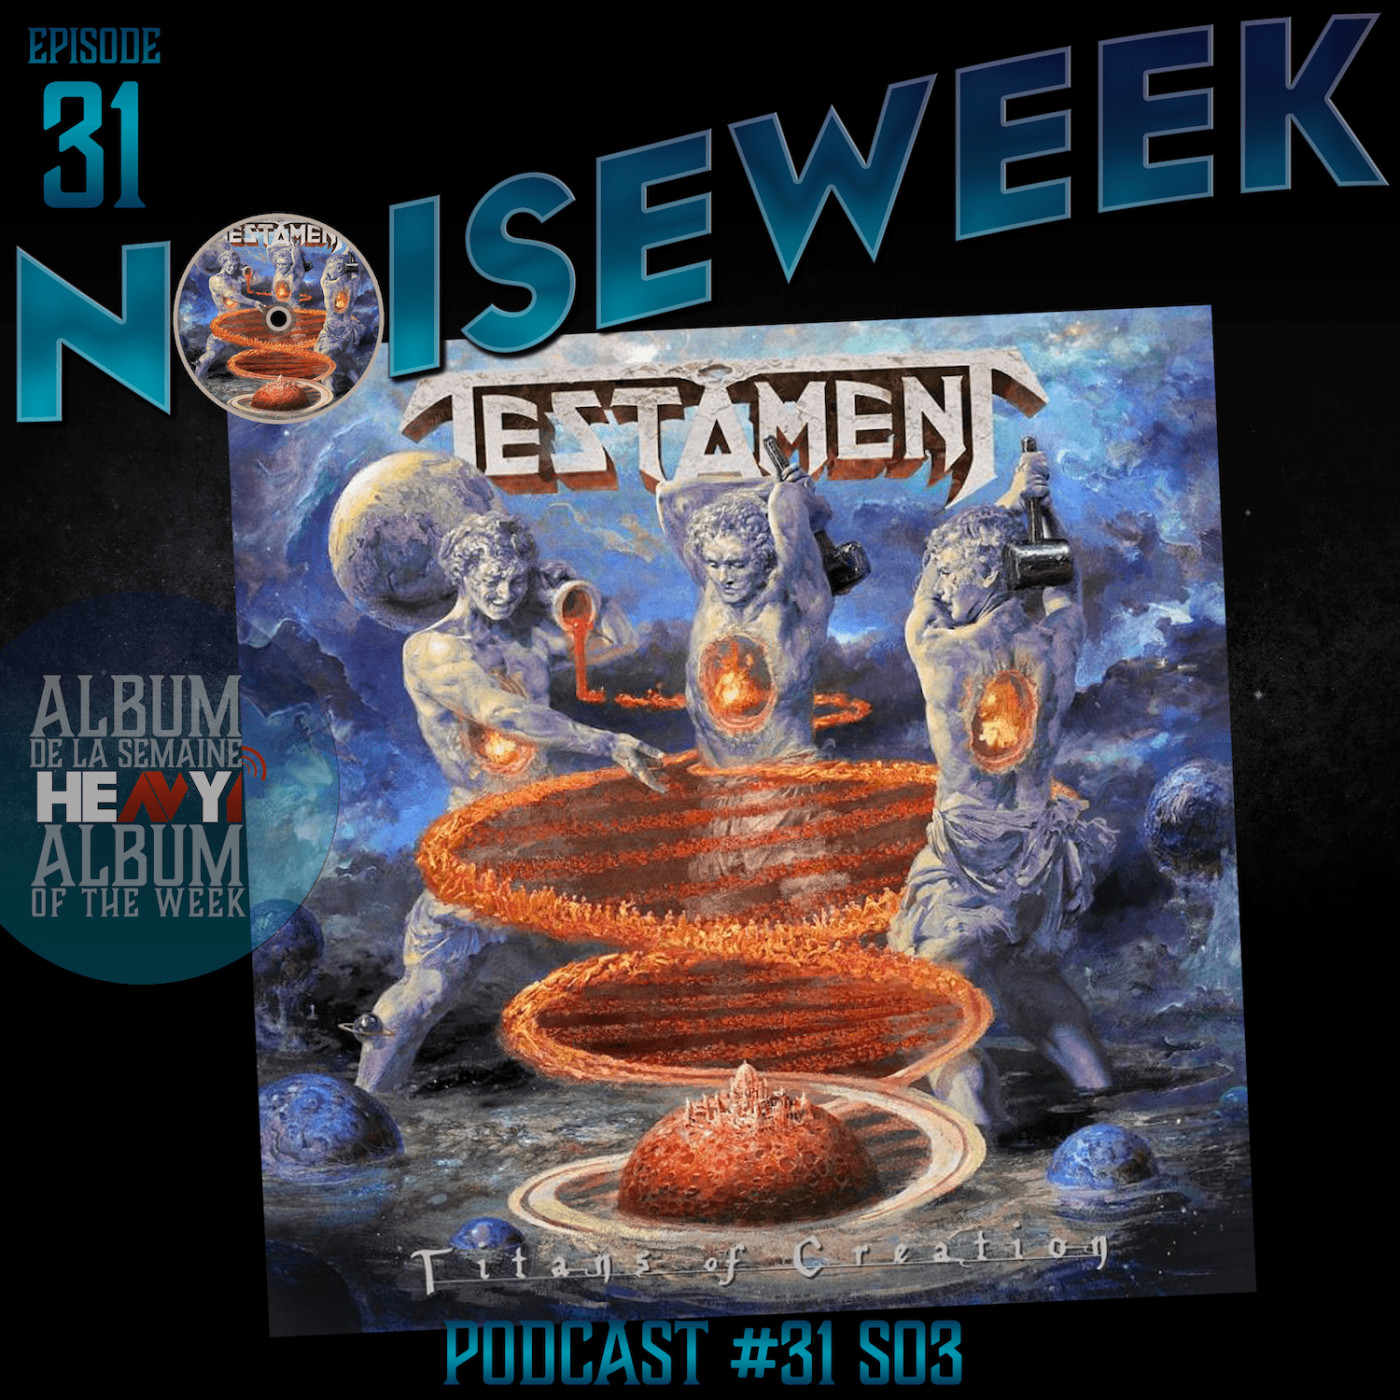 Noiseweek #31 Saison 3